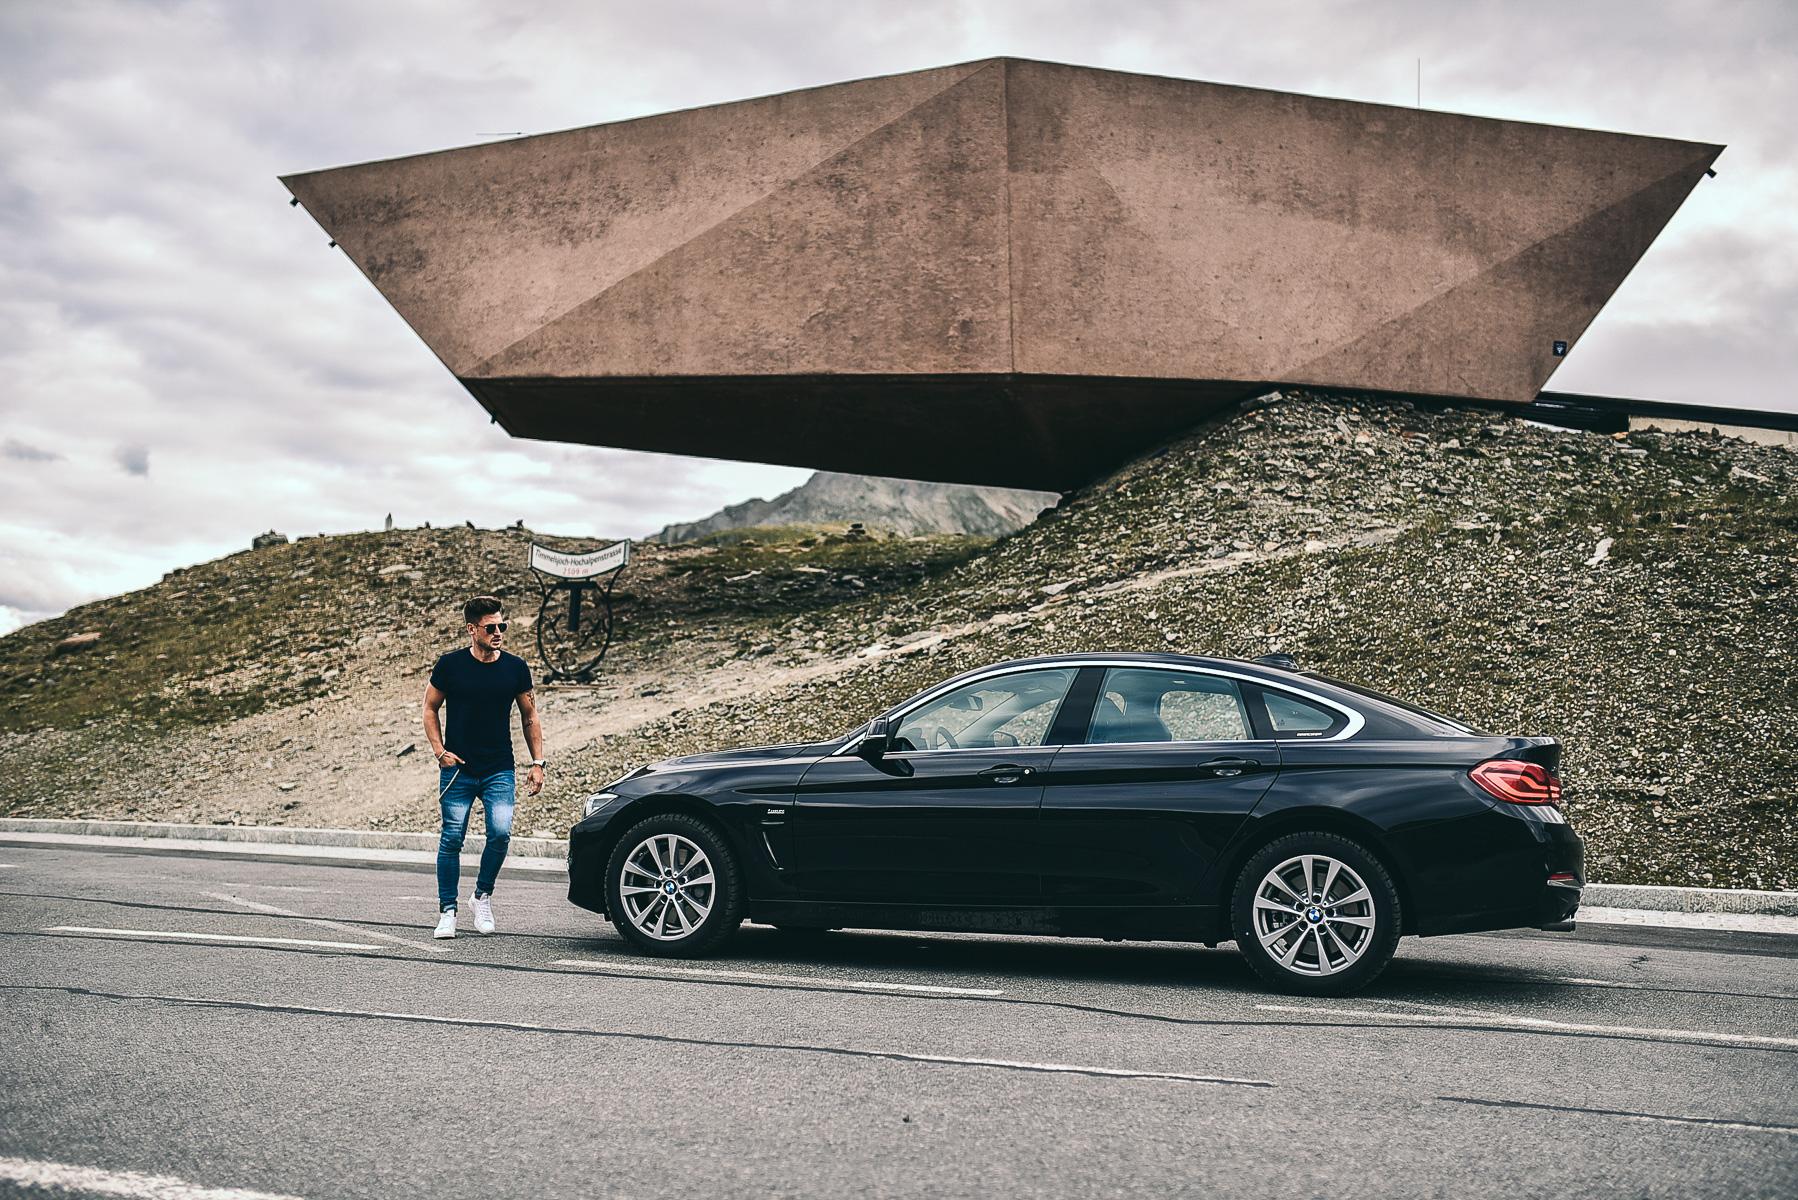 Tommeezjerry-Maennermodeblog-Maennermode-Fashionblog-Styleblog-Berlinblog--Lifestyleblog-BMW-Series-4-Gran-Coupé-Roadtrip-Video-Youtube-Southtirol